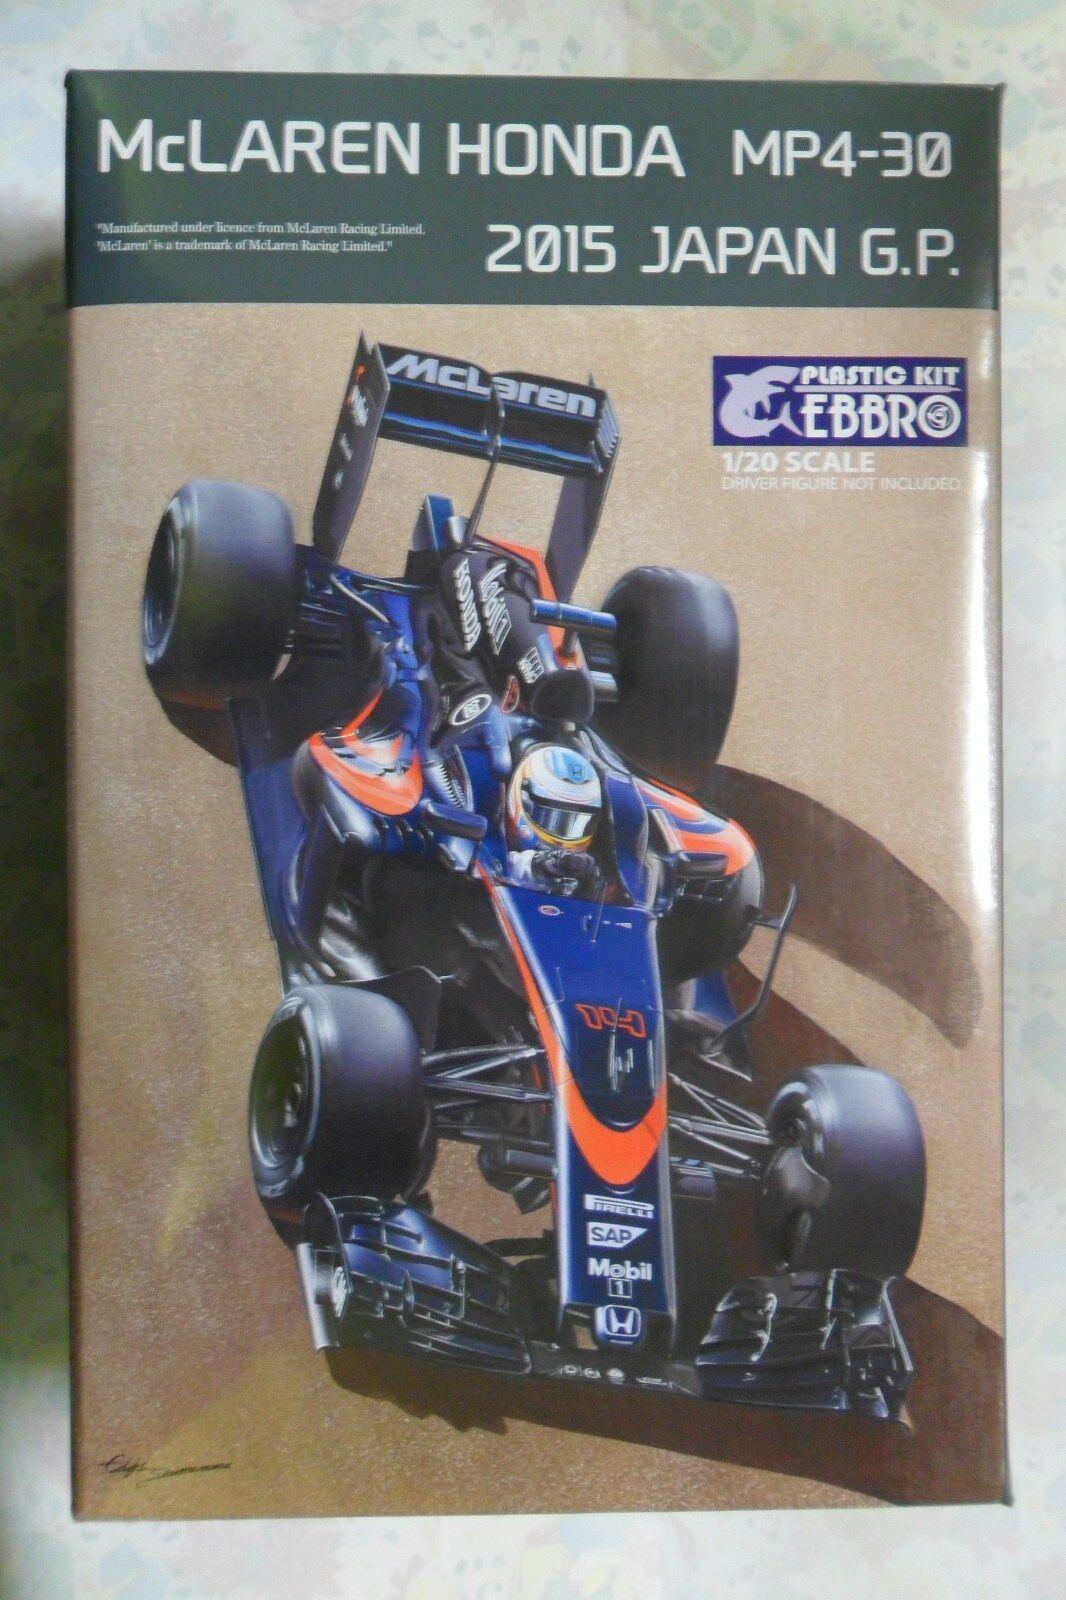 EBBRO 1 20 KIT IN PLASTICA MCLAREN HONDA MP4-30 2015 2015 2015 JAPAN GP ART 015 4800 e4c8a0